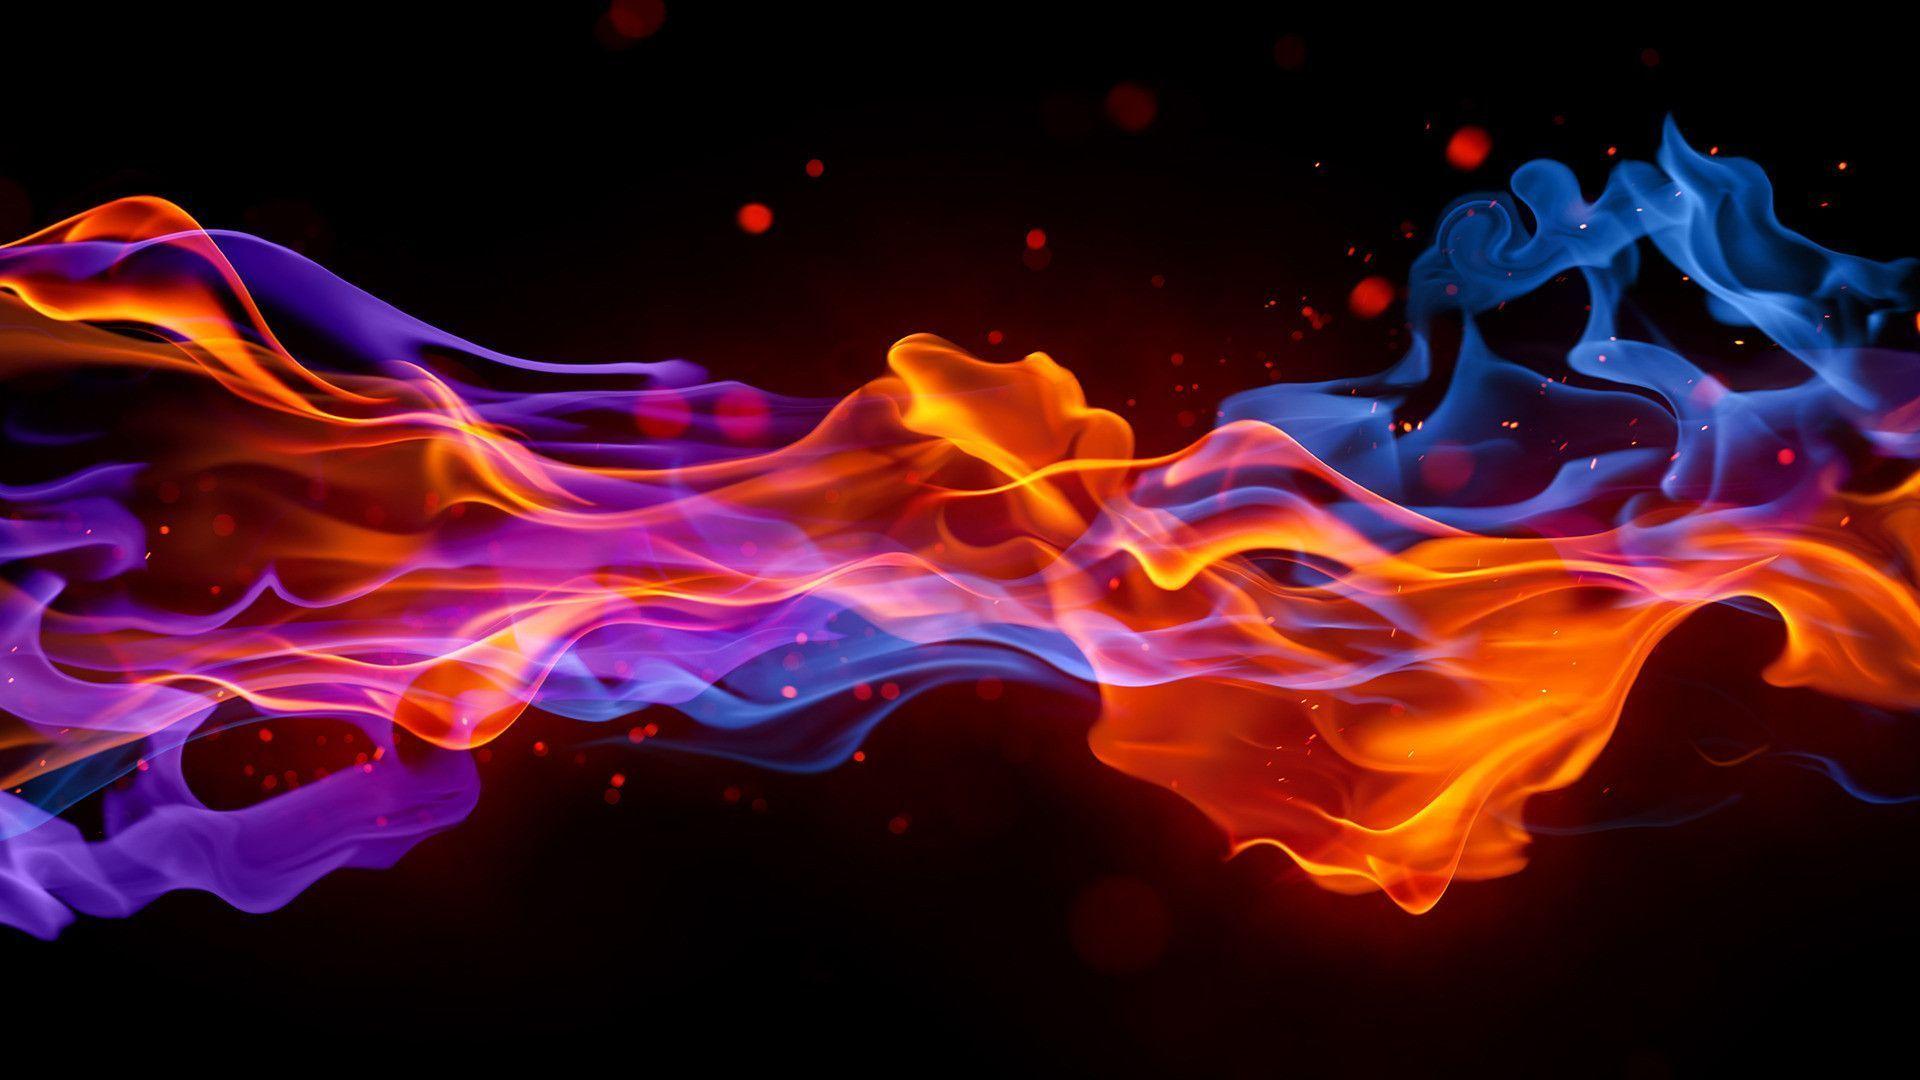 Cool Fire Backgrounds Wallpaper